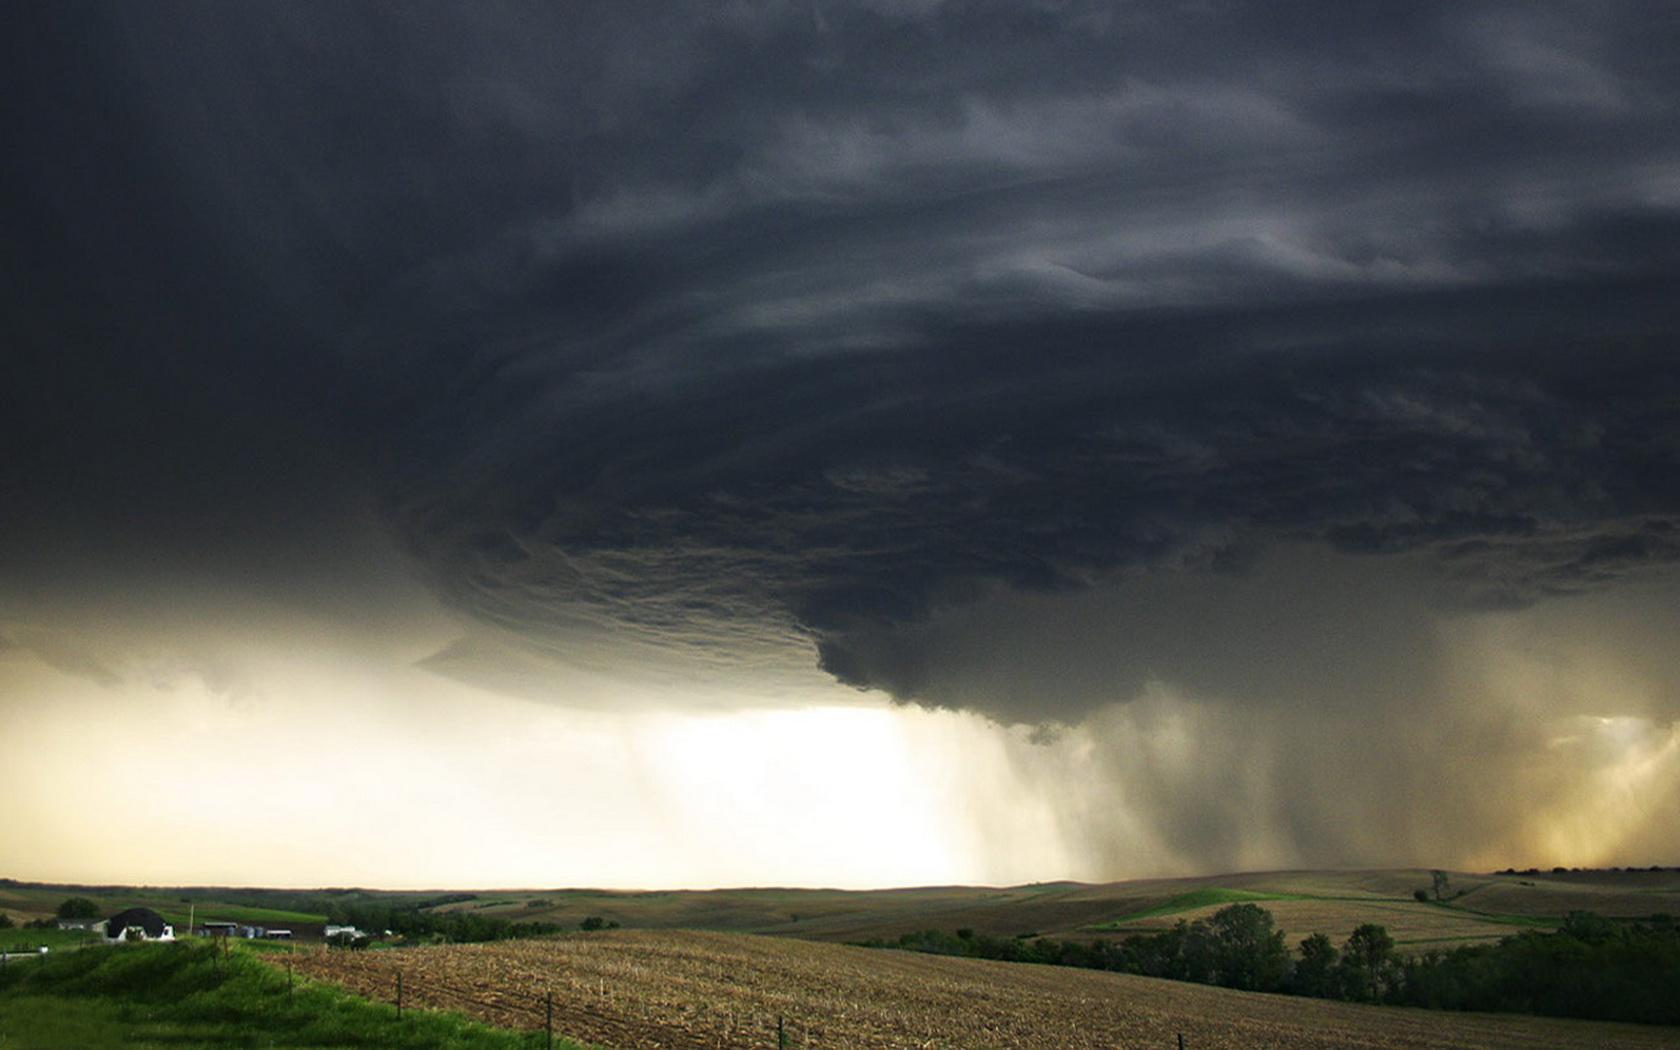 Tornado Storm Wallpaper HD wallpaper background 1680x1050